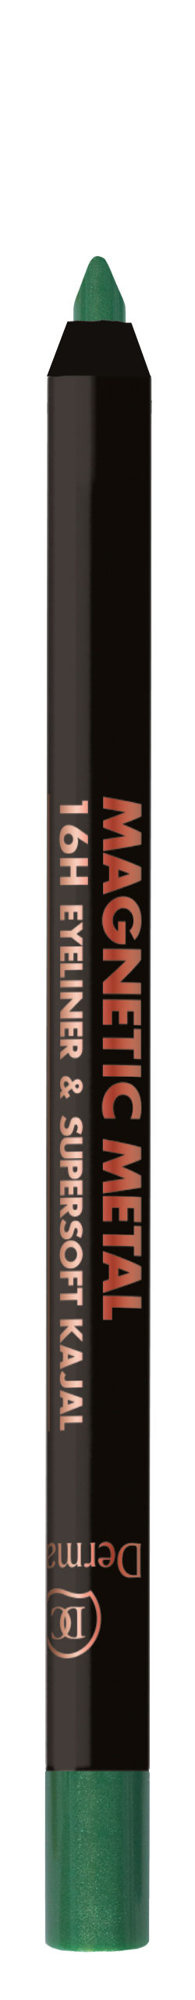 BONUS PAKKET - Artist Lash Long-Lasting Mascara/Eyeliner/Magnetic Metal 16H eyeliner